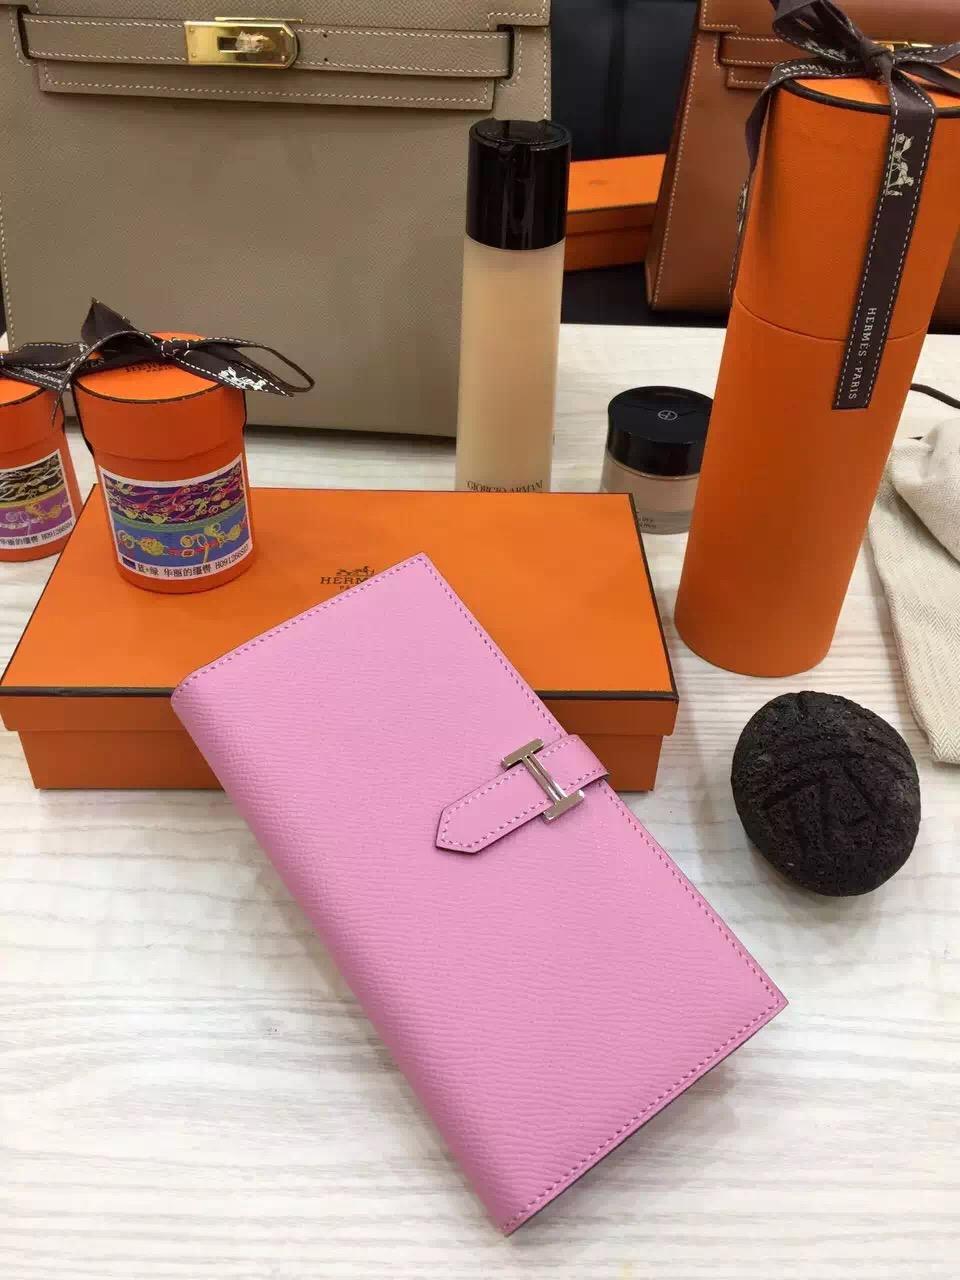 Pretty Hermes Original Epsom Leather Bearn Wallet Purse in Rose Sakura